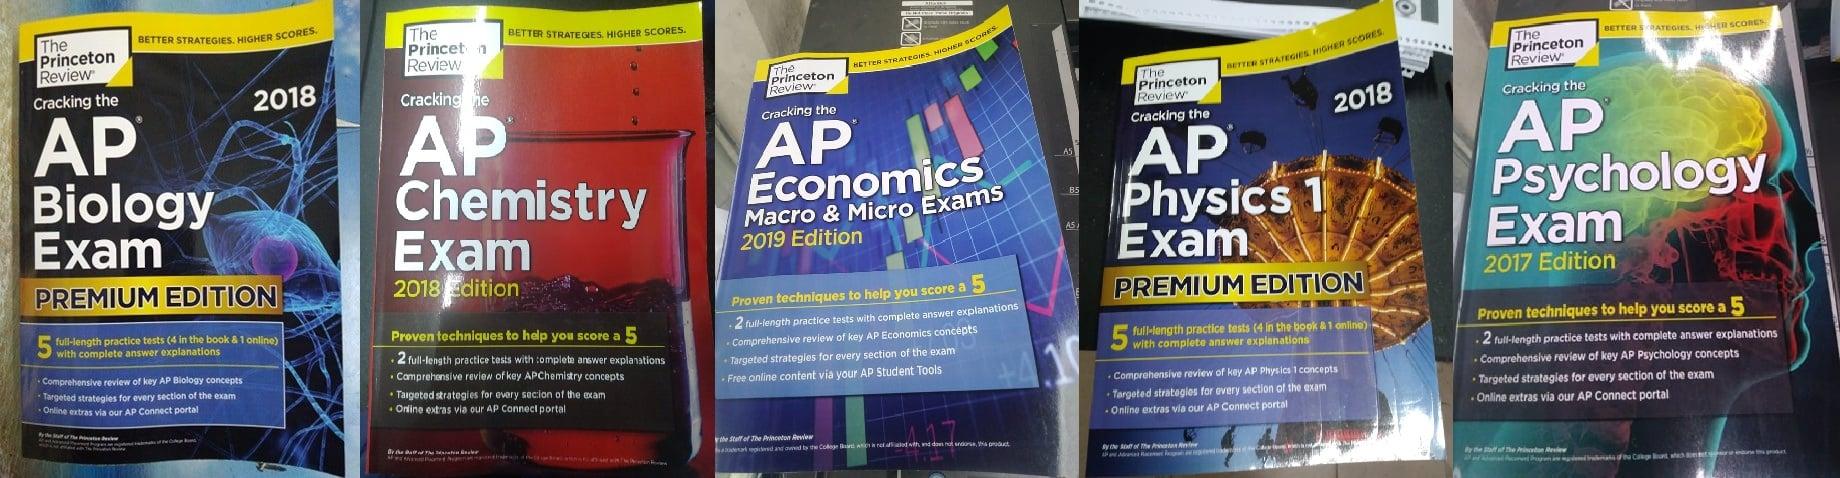 Ebooks Max30: Sách du học - Khóa học SAT, GRE, GMAT